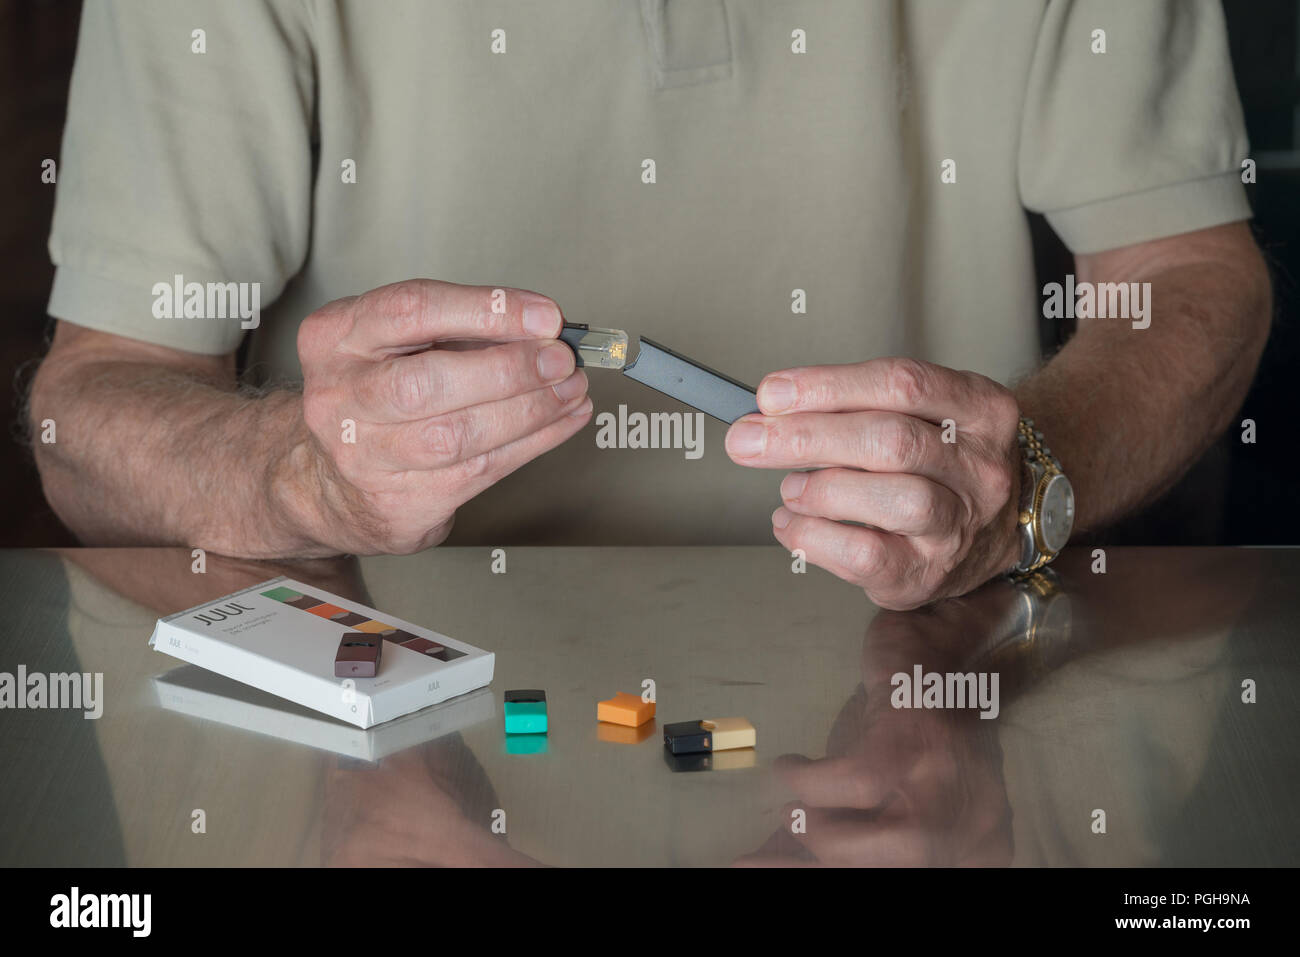 Elderly Smoker Stock Photos & Elderly Smoker Stock Images - Alamy